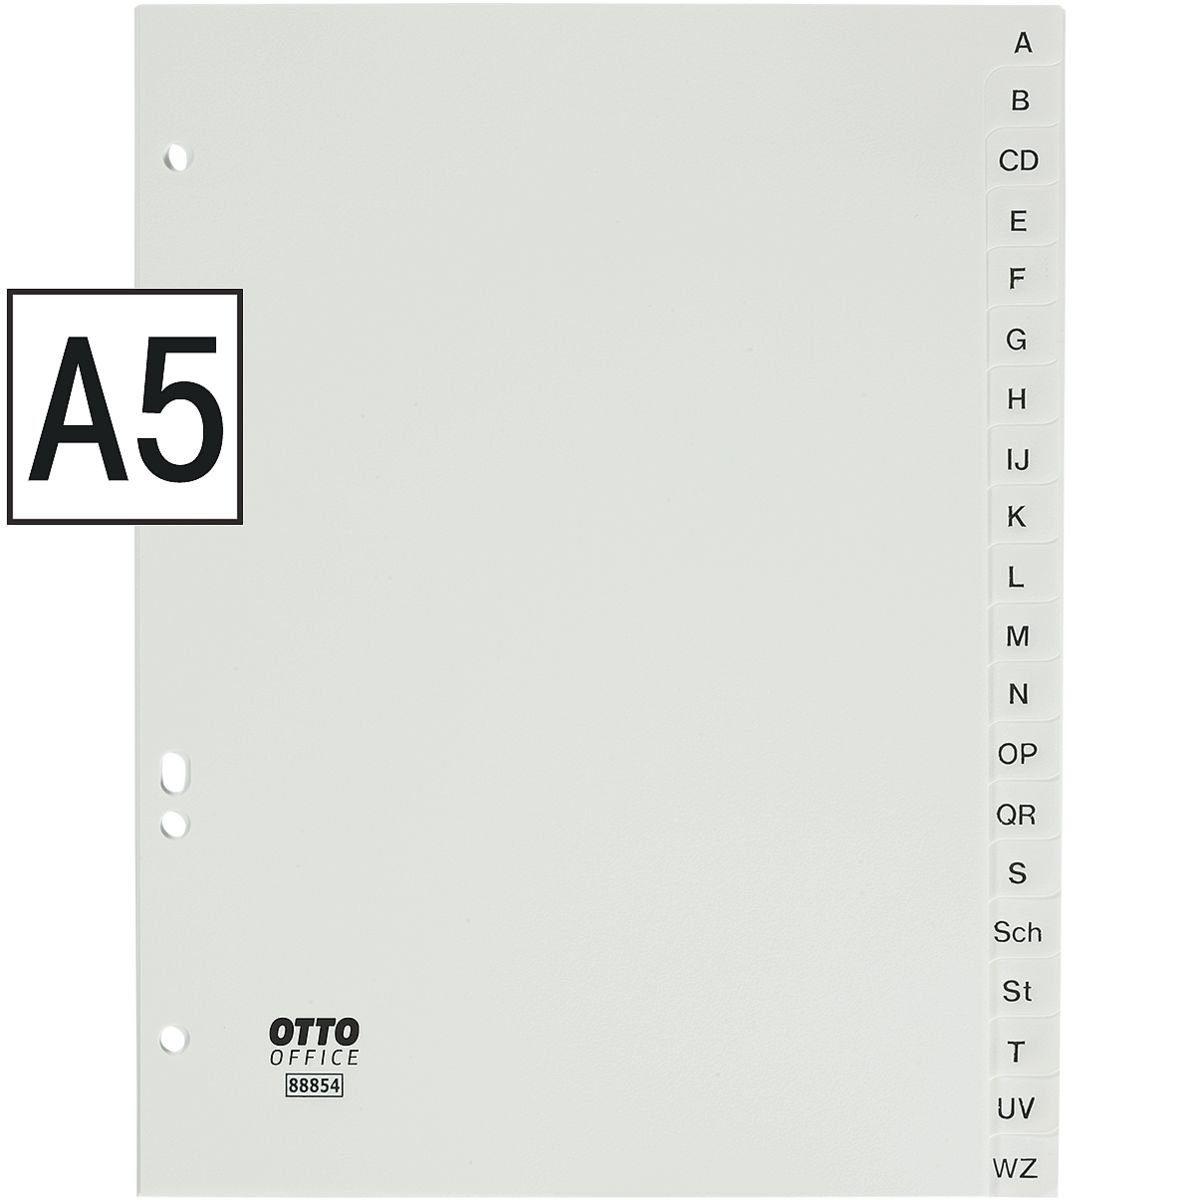 OTTO Office Standard Kunststoffregister A-Z A5 weiß